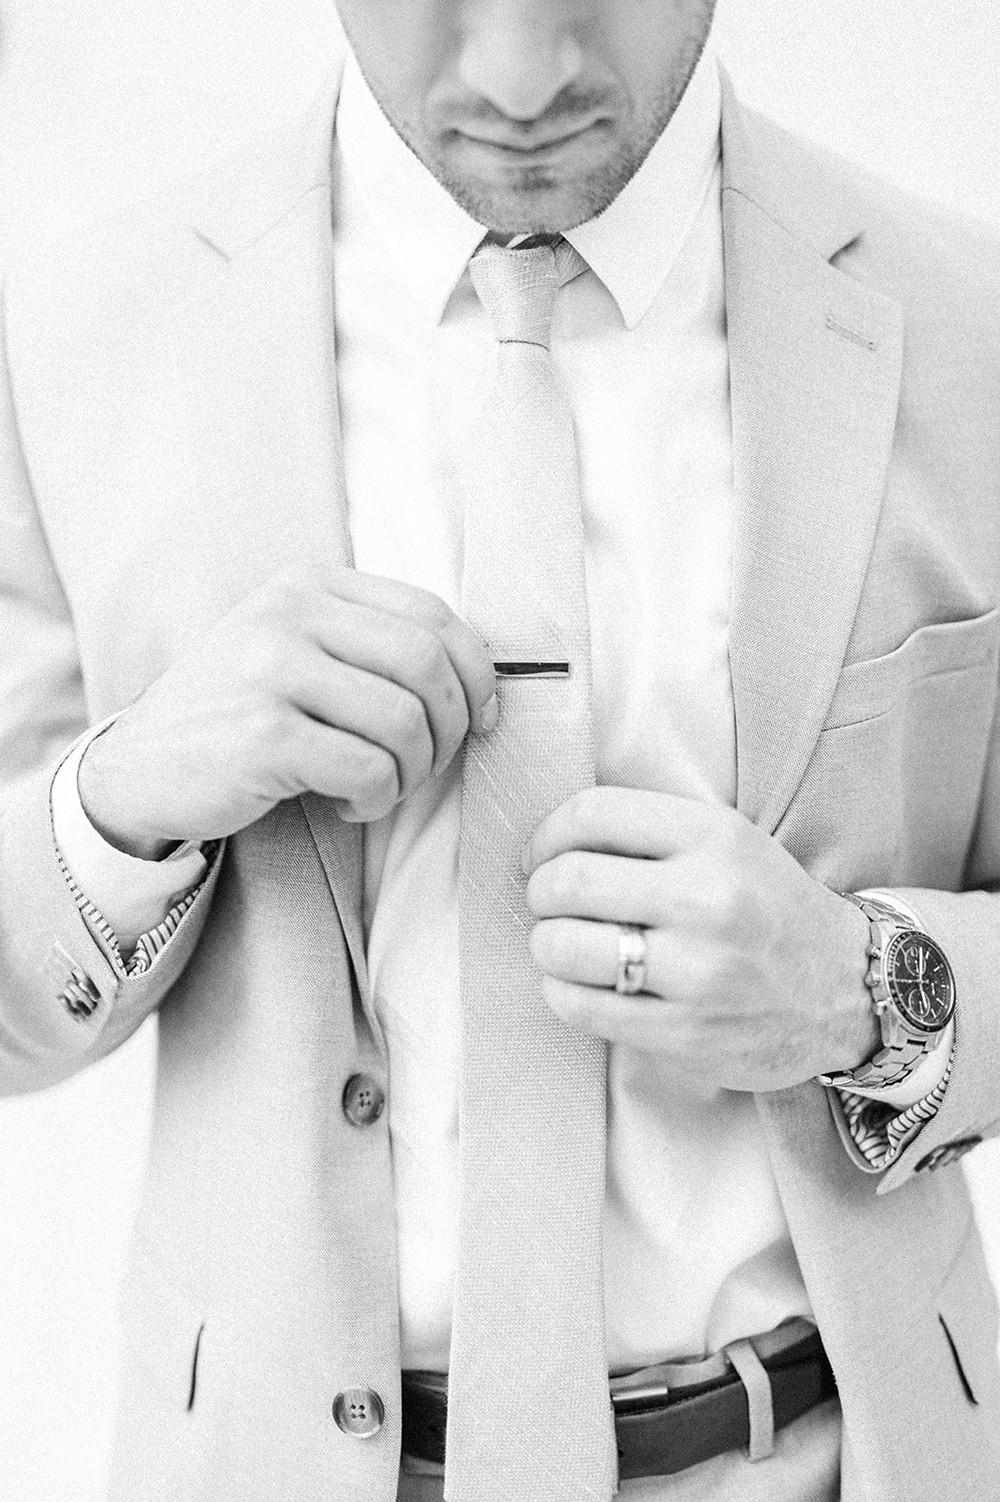 farmers market wedding venue, rustic wedding venue, rustic wedding cake, elegant weddings, fine art photography, film photography, average jane photography, nova scotia weddings, wedding photographer halifax, halifax weddings, fine art film, looks like film, tale of tulle, magnolia rouge, wedding sparrow, martha stewart weddings, vineyard weddings, wedding chicks, canadian wedding magazine, wedding dress, wedding ring, nova ring boxes